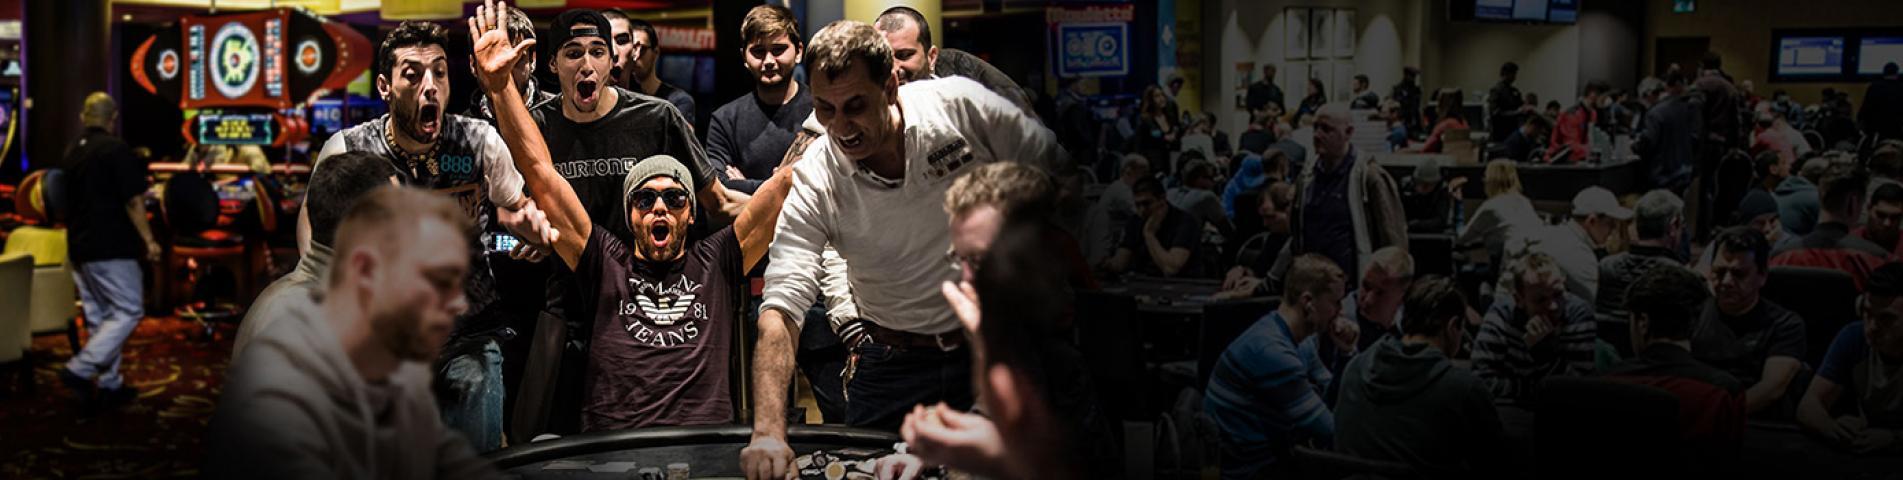 بوكر اون لاين Online Poker